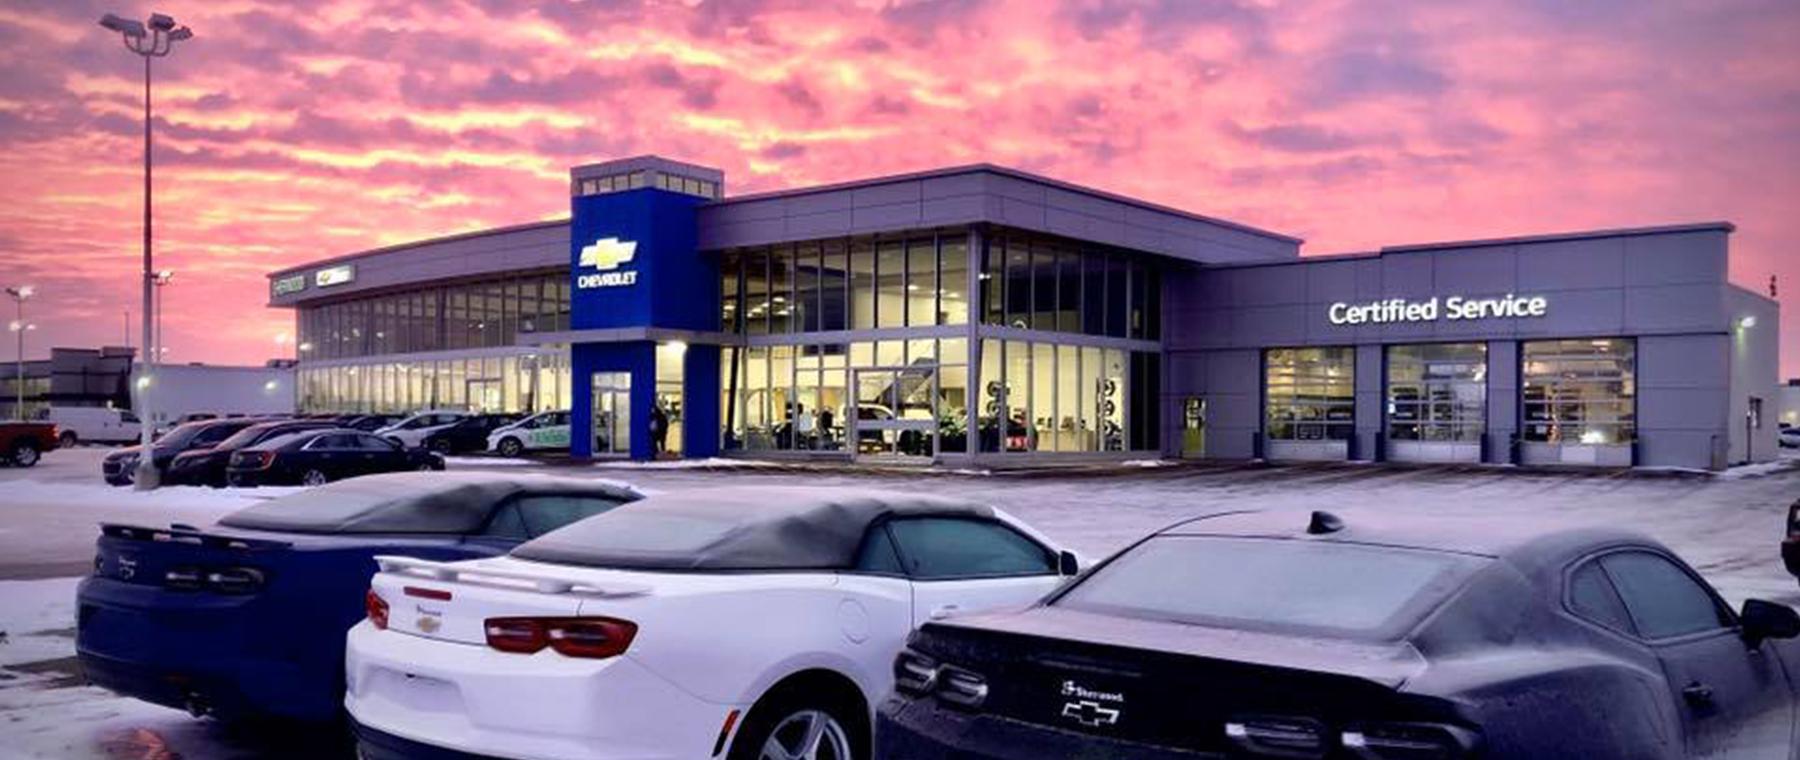 Sunrise behind Sherwood Chevrolet building